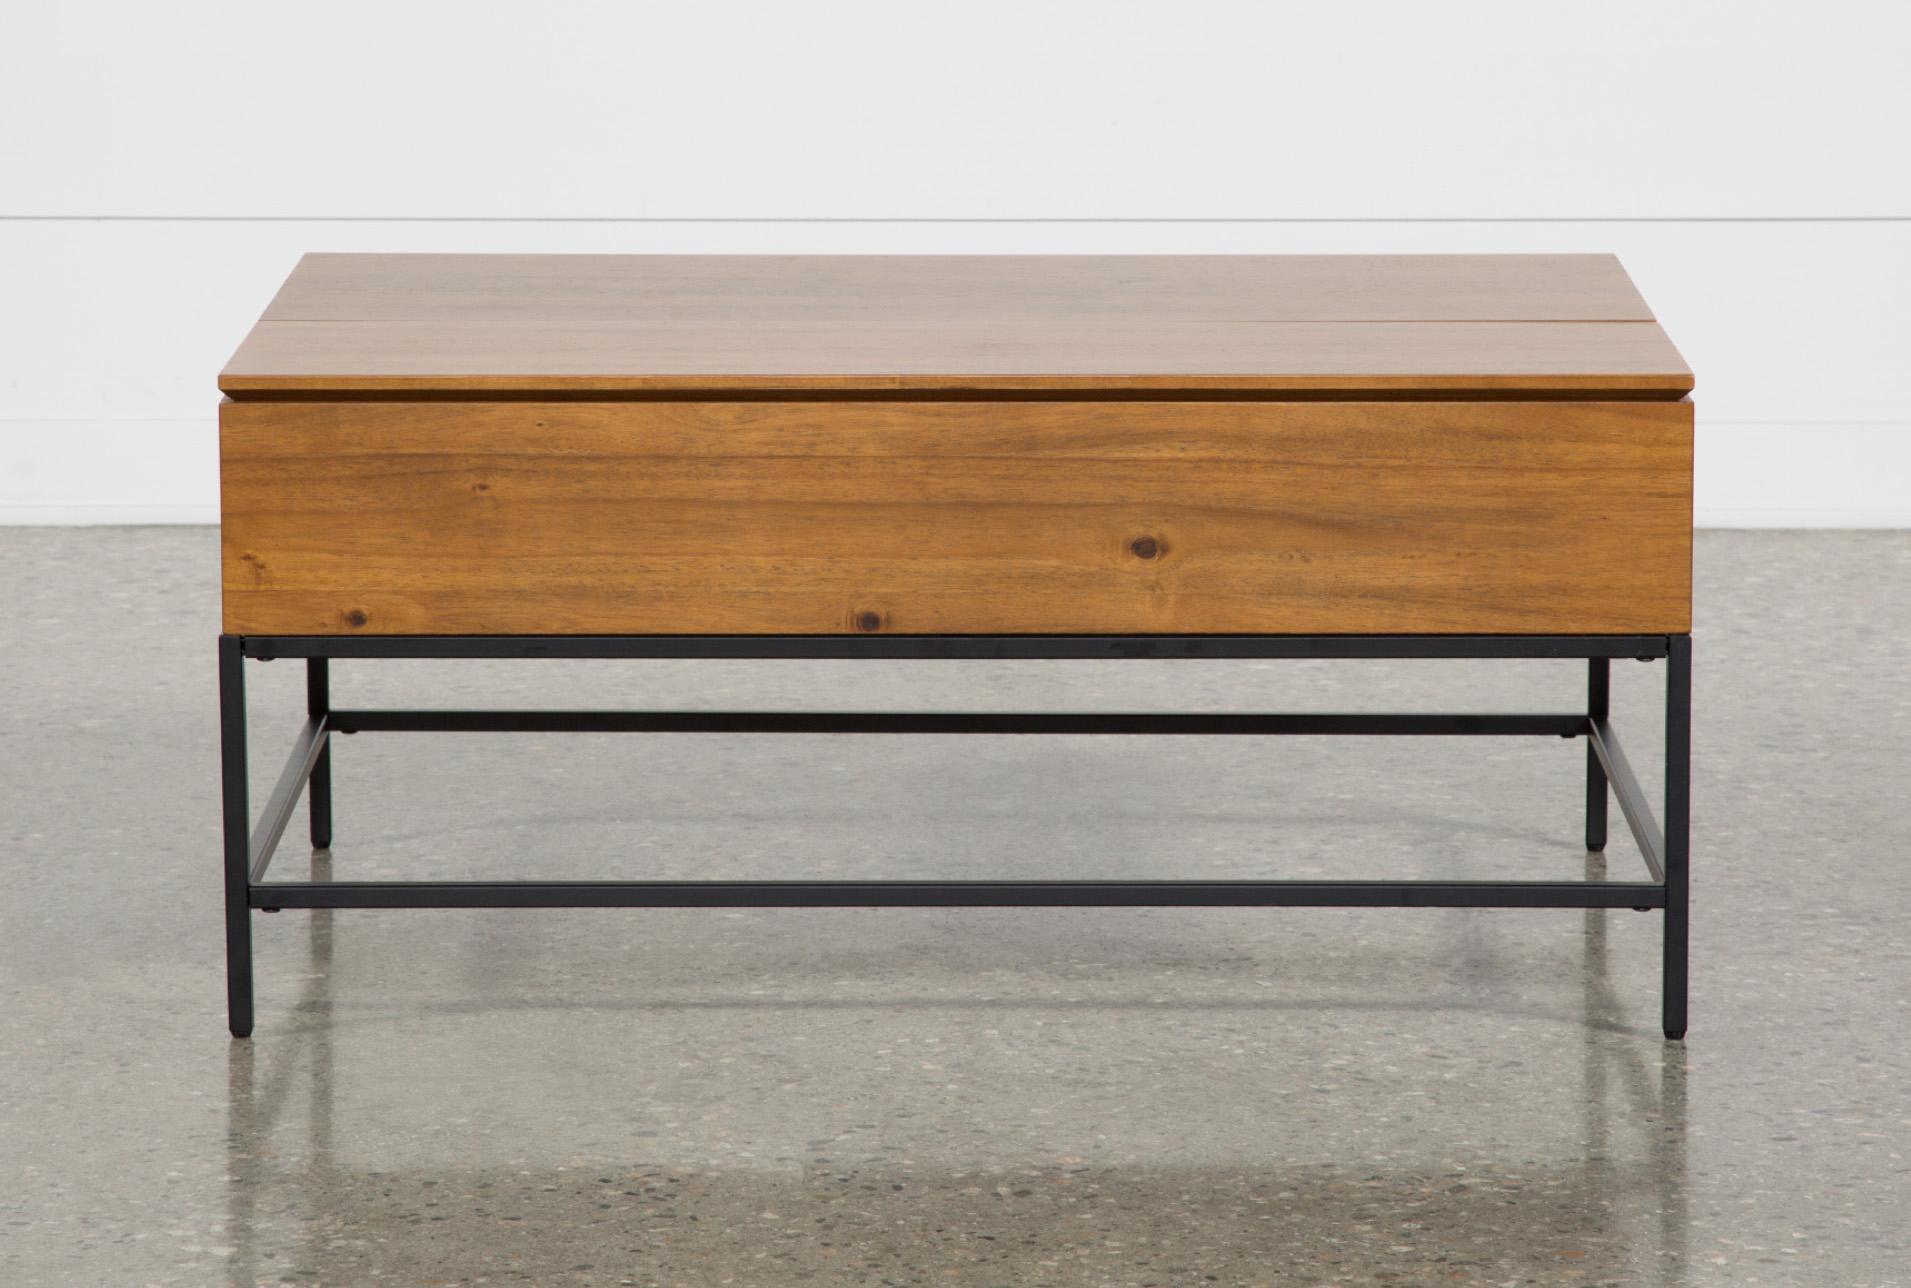 Hollis Lift Top Coffee Table Lift Top Coffee Table Coffee Table Coffee Table Living Spaces [ 1288 x 1911 Pixel ]